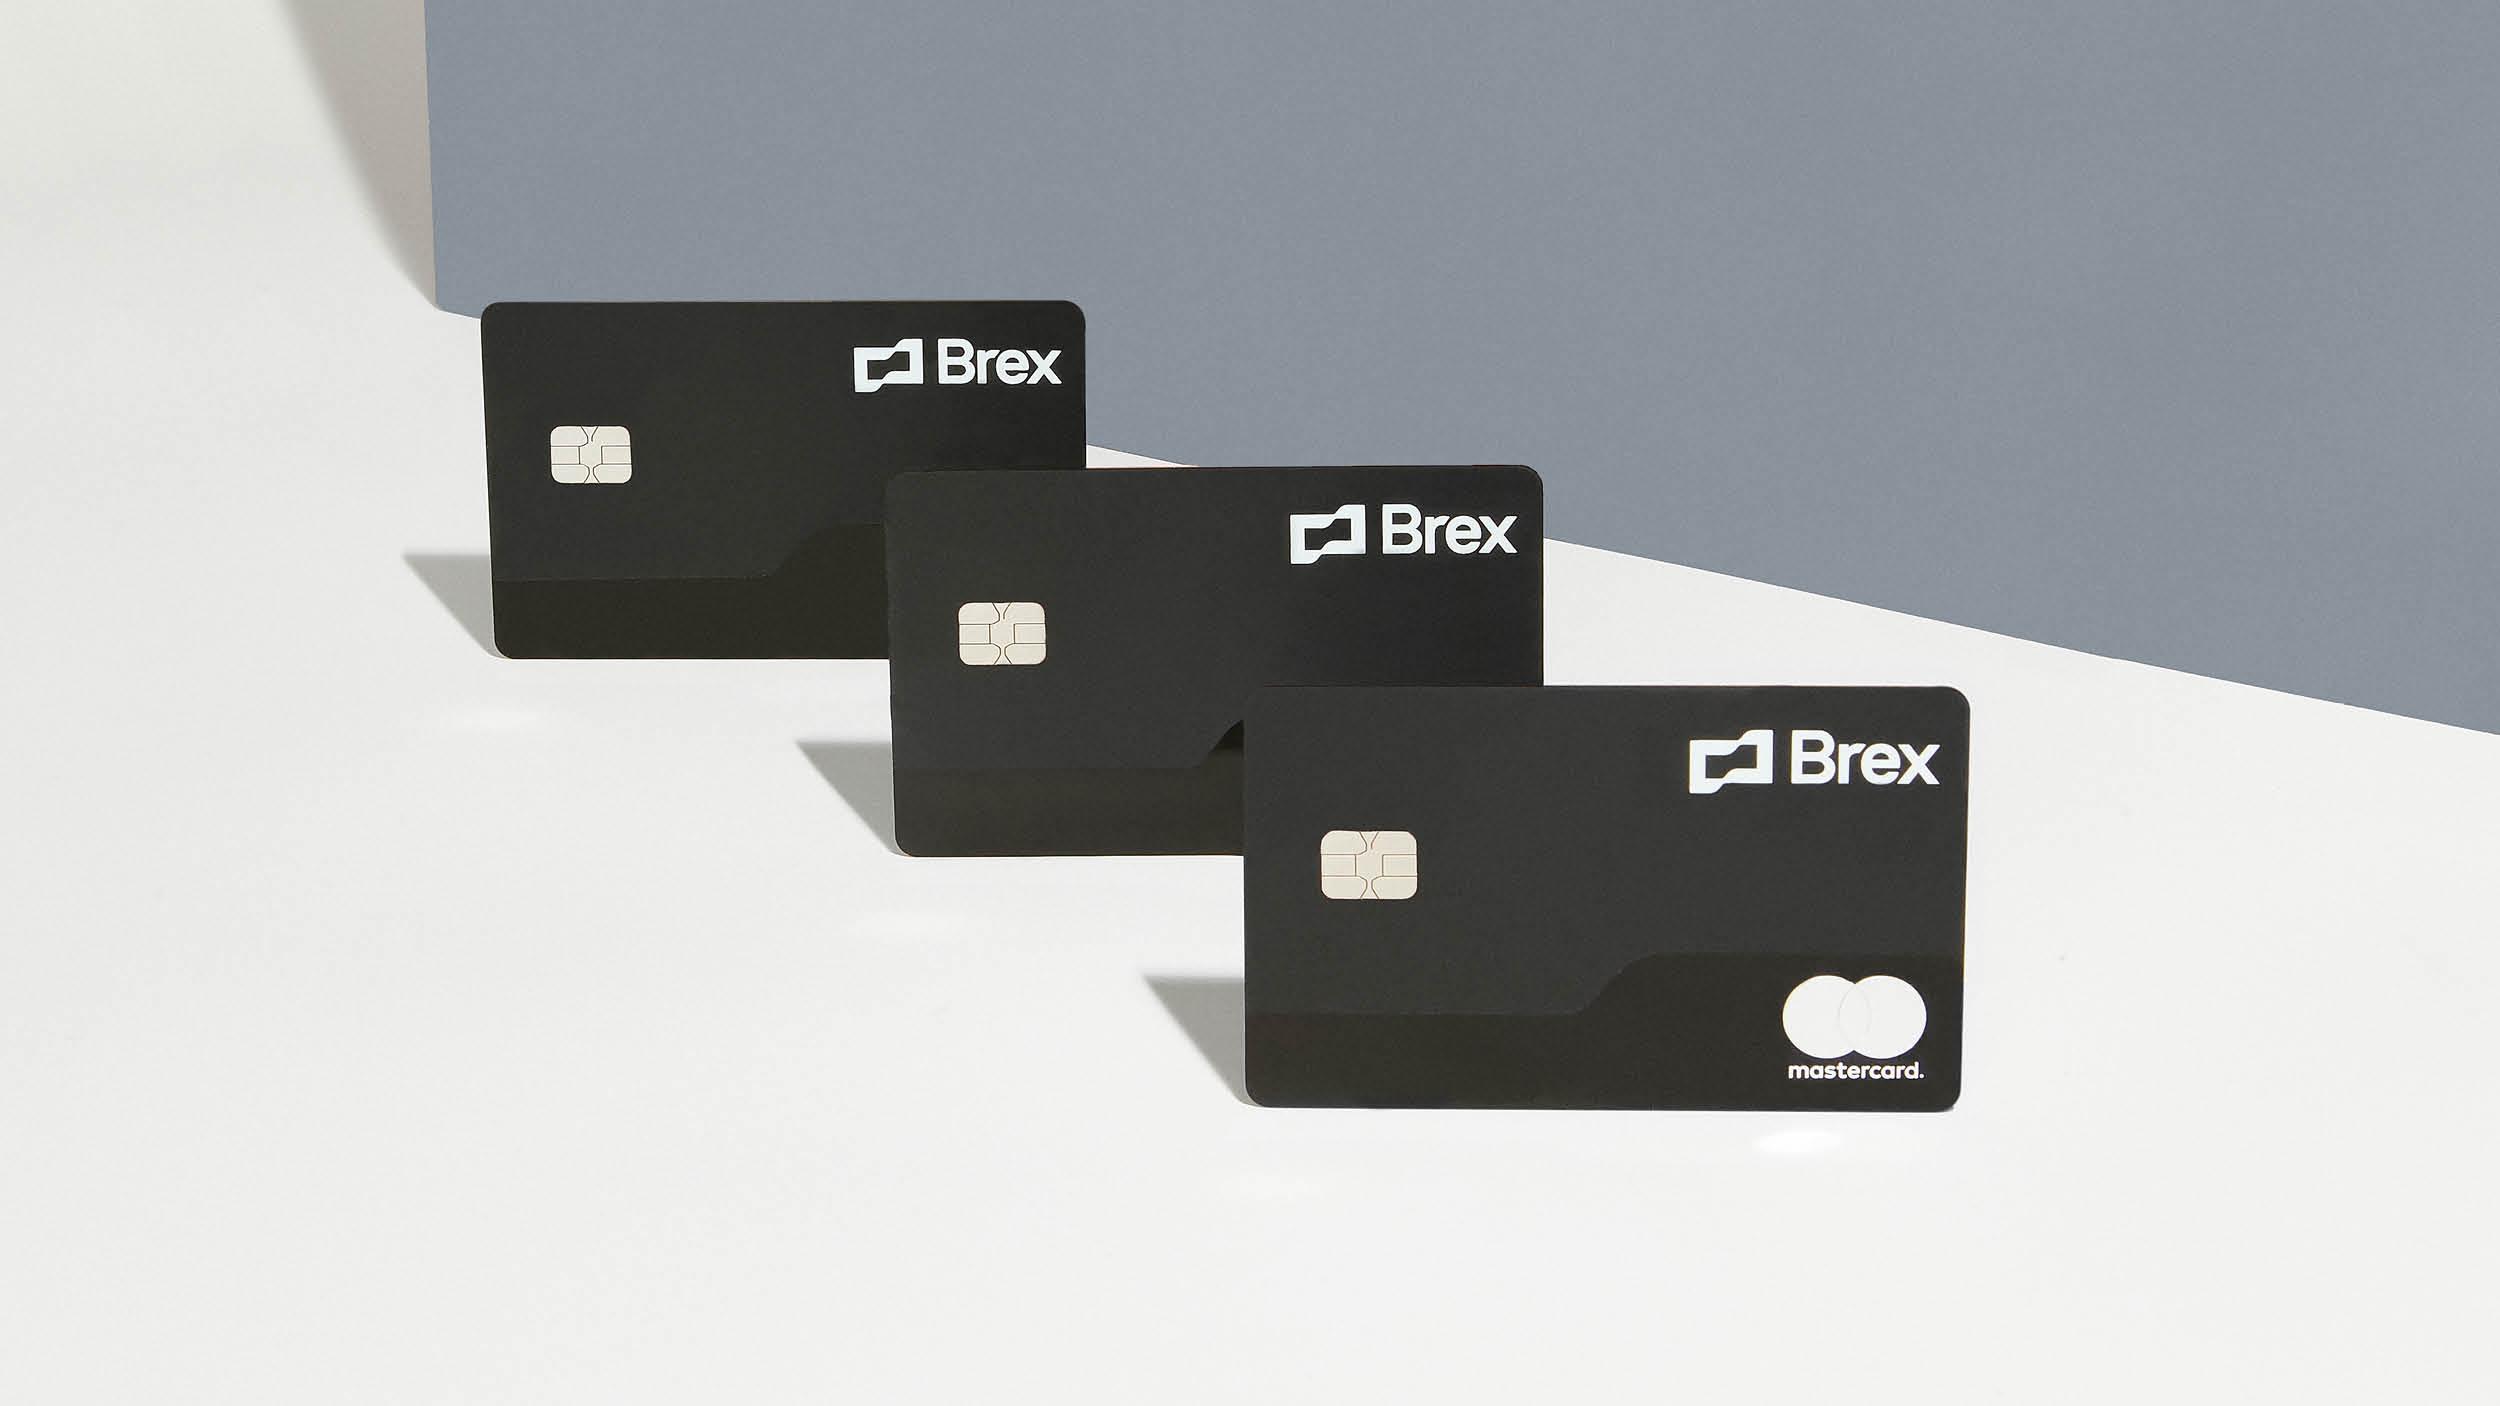 Brex cards